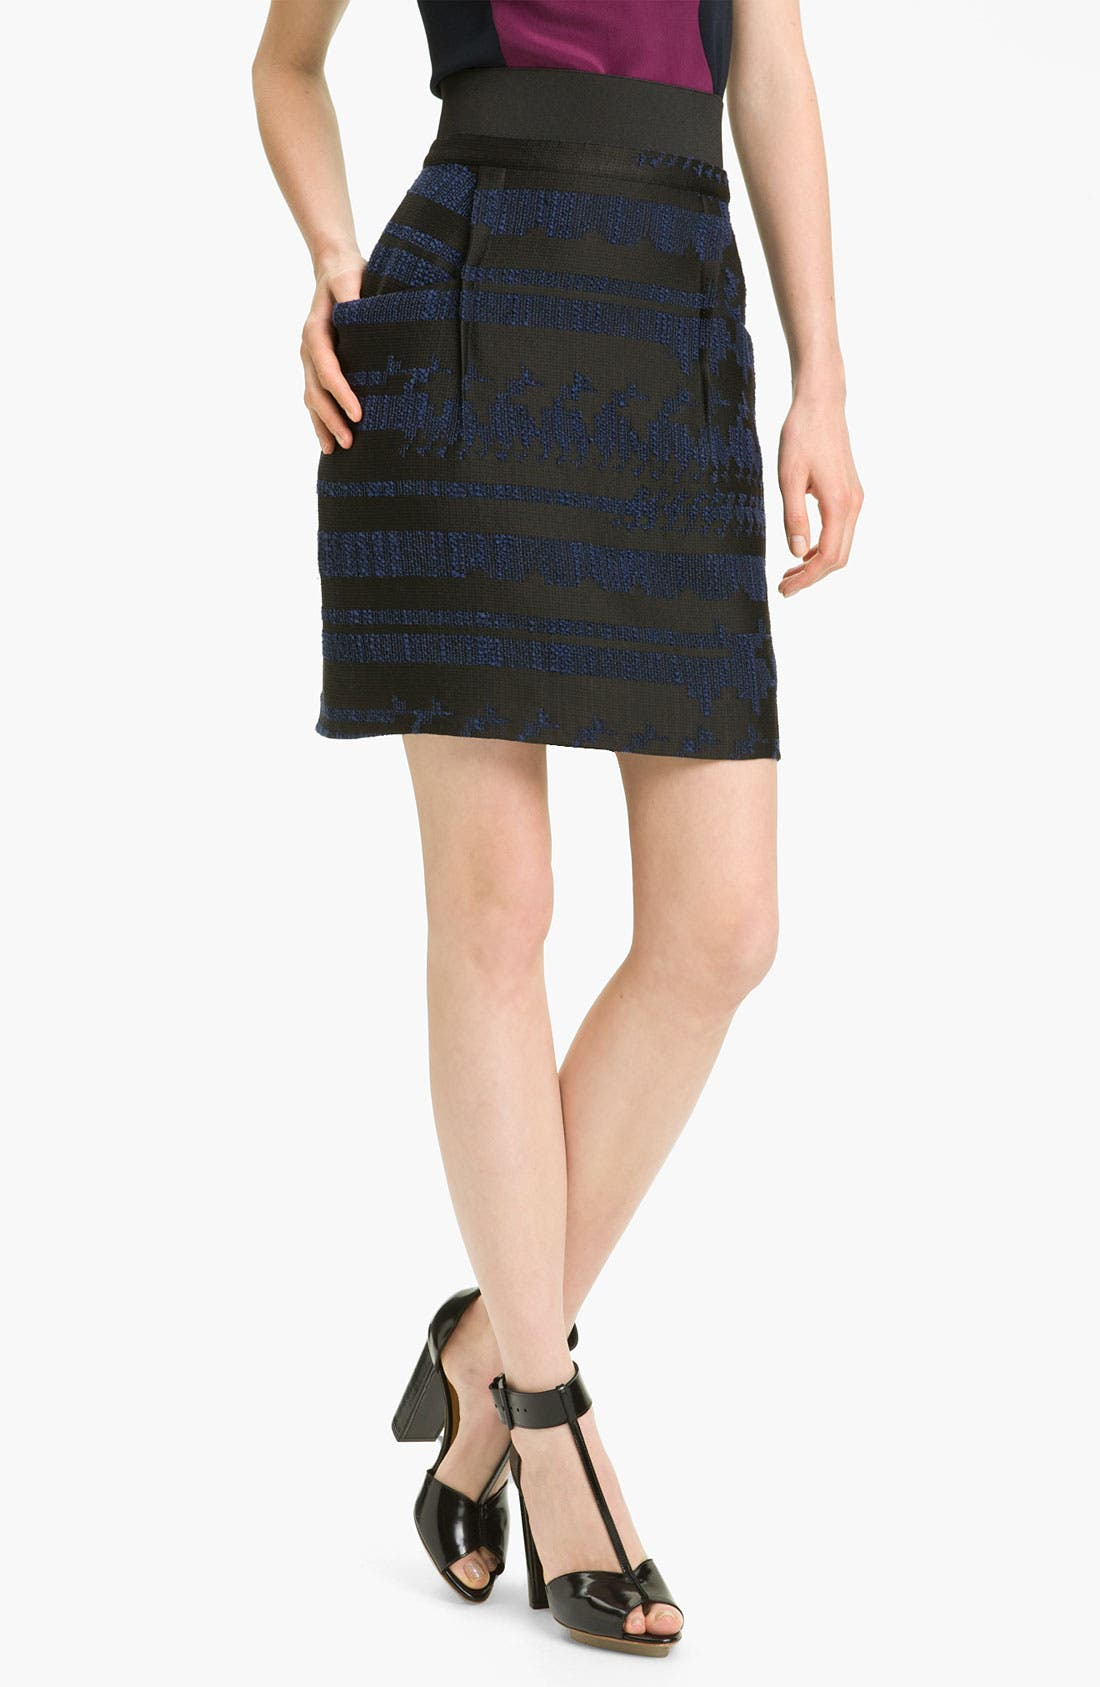 Alternate Image 1 Selected - 3.1 Phillip Lim Jacquard Skirt